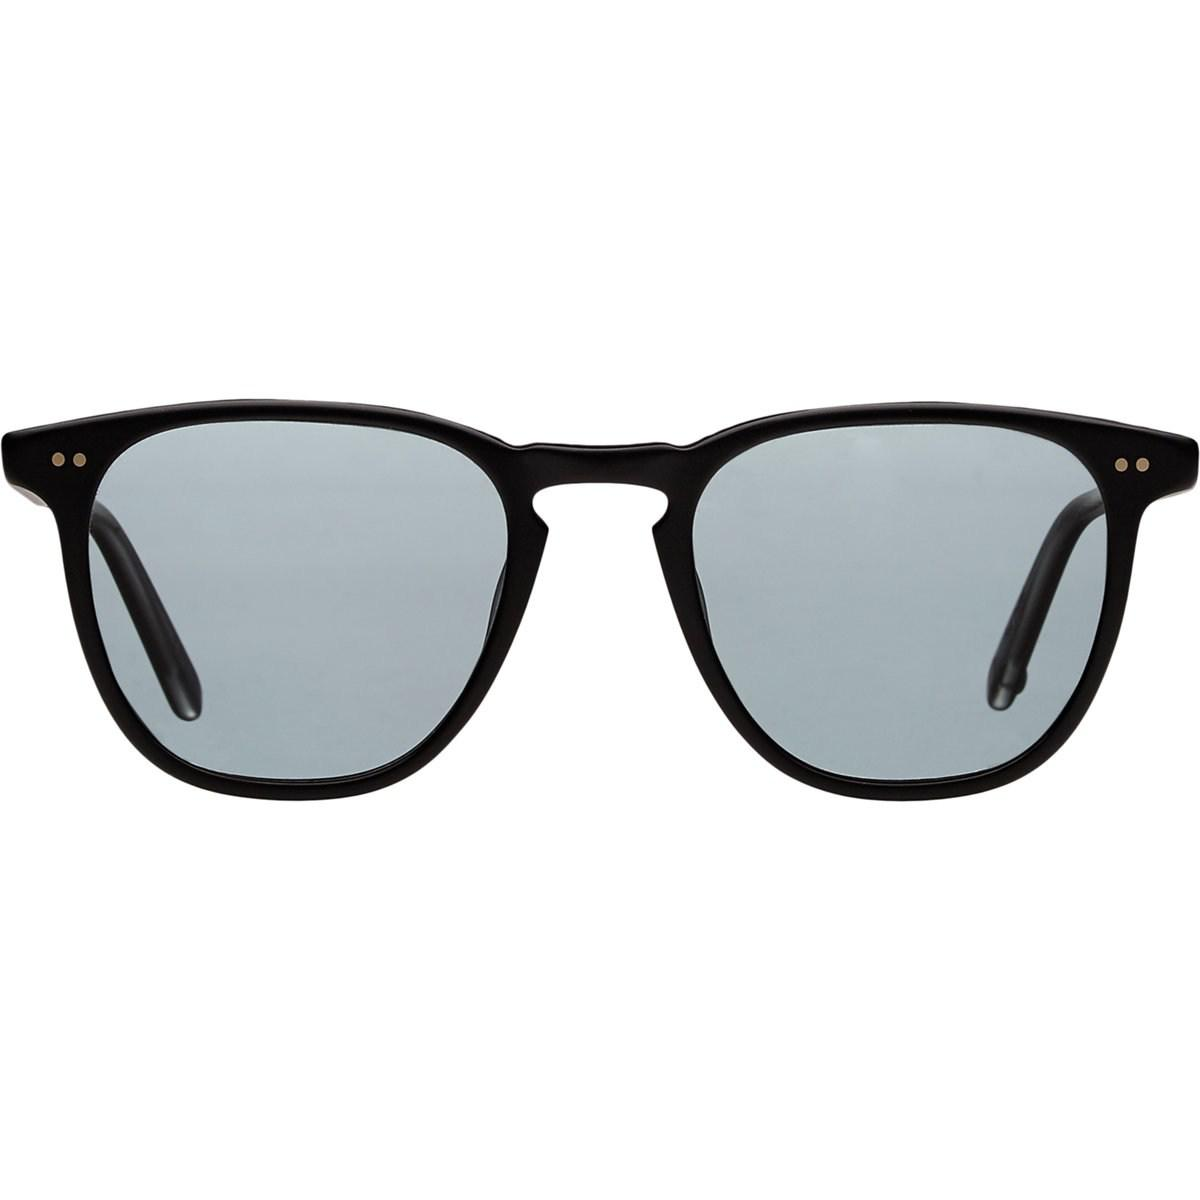 23f1aa79c69 Lyst - Garrett Leight Brooks Sunglasses in Black for Men